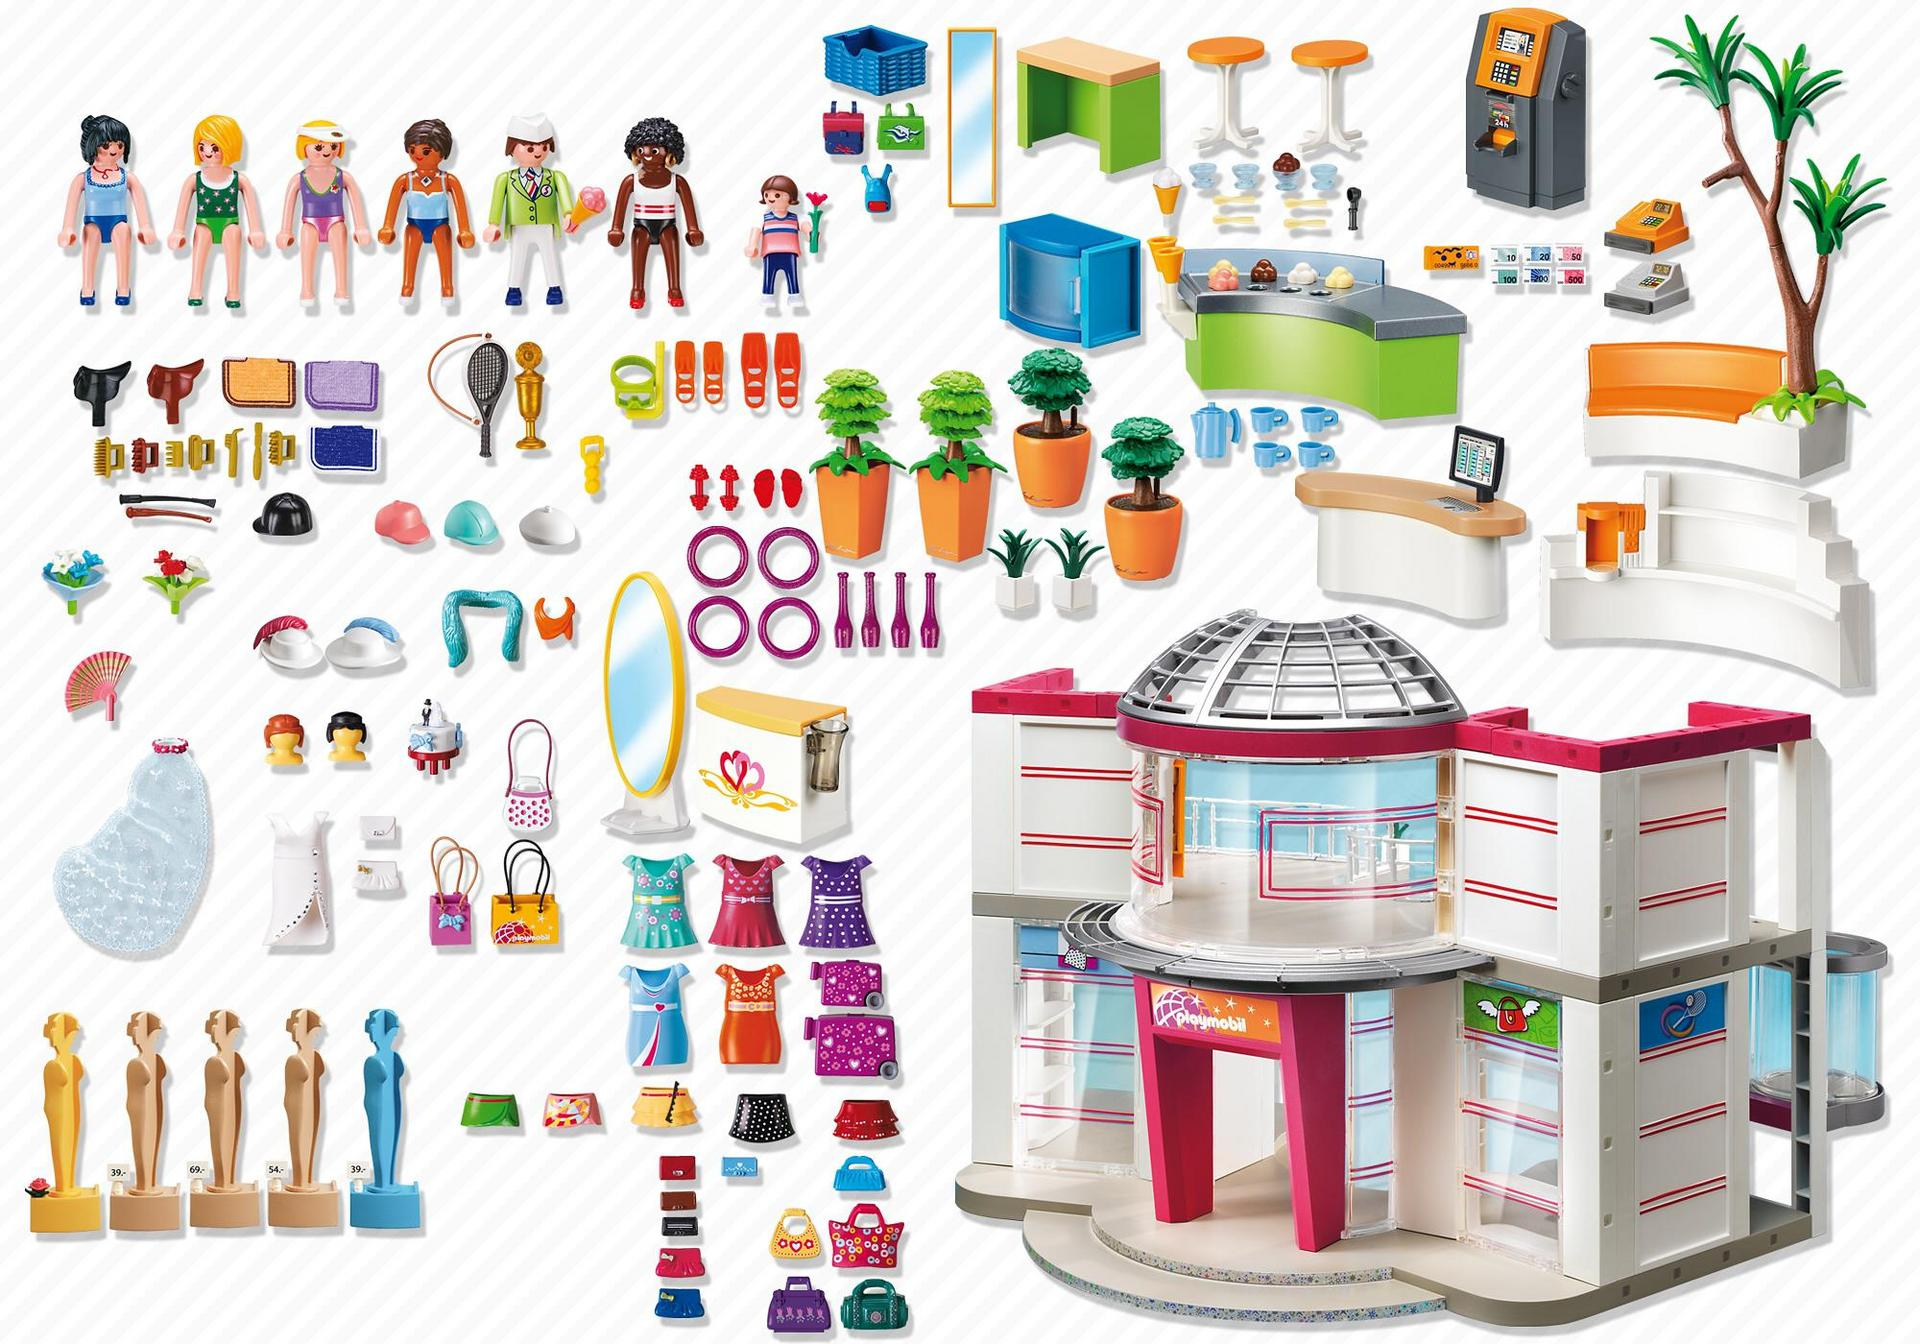 Elegant Playmobil Ausmalbilder Shopping Center Art Von Malvorlagen